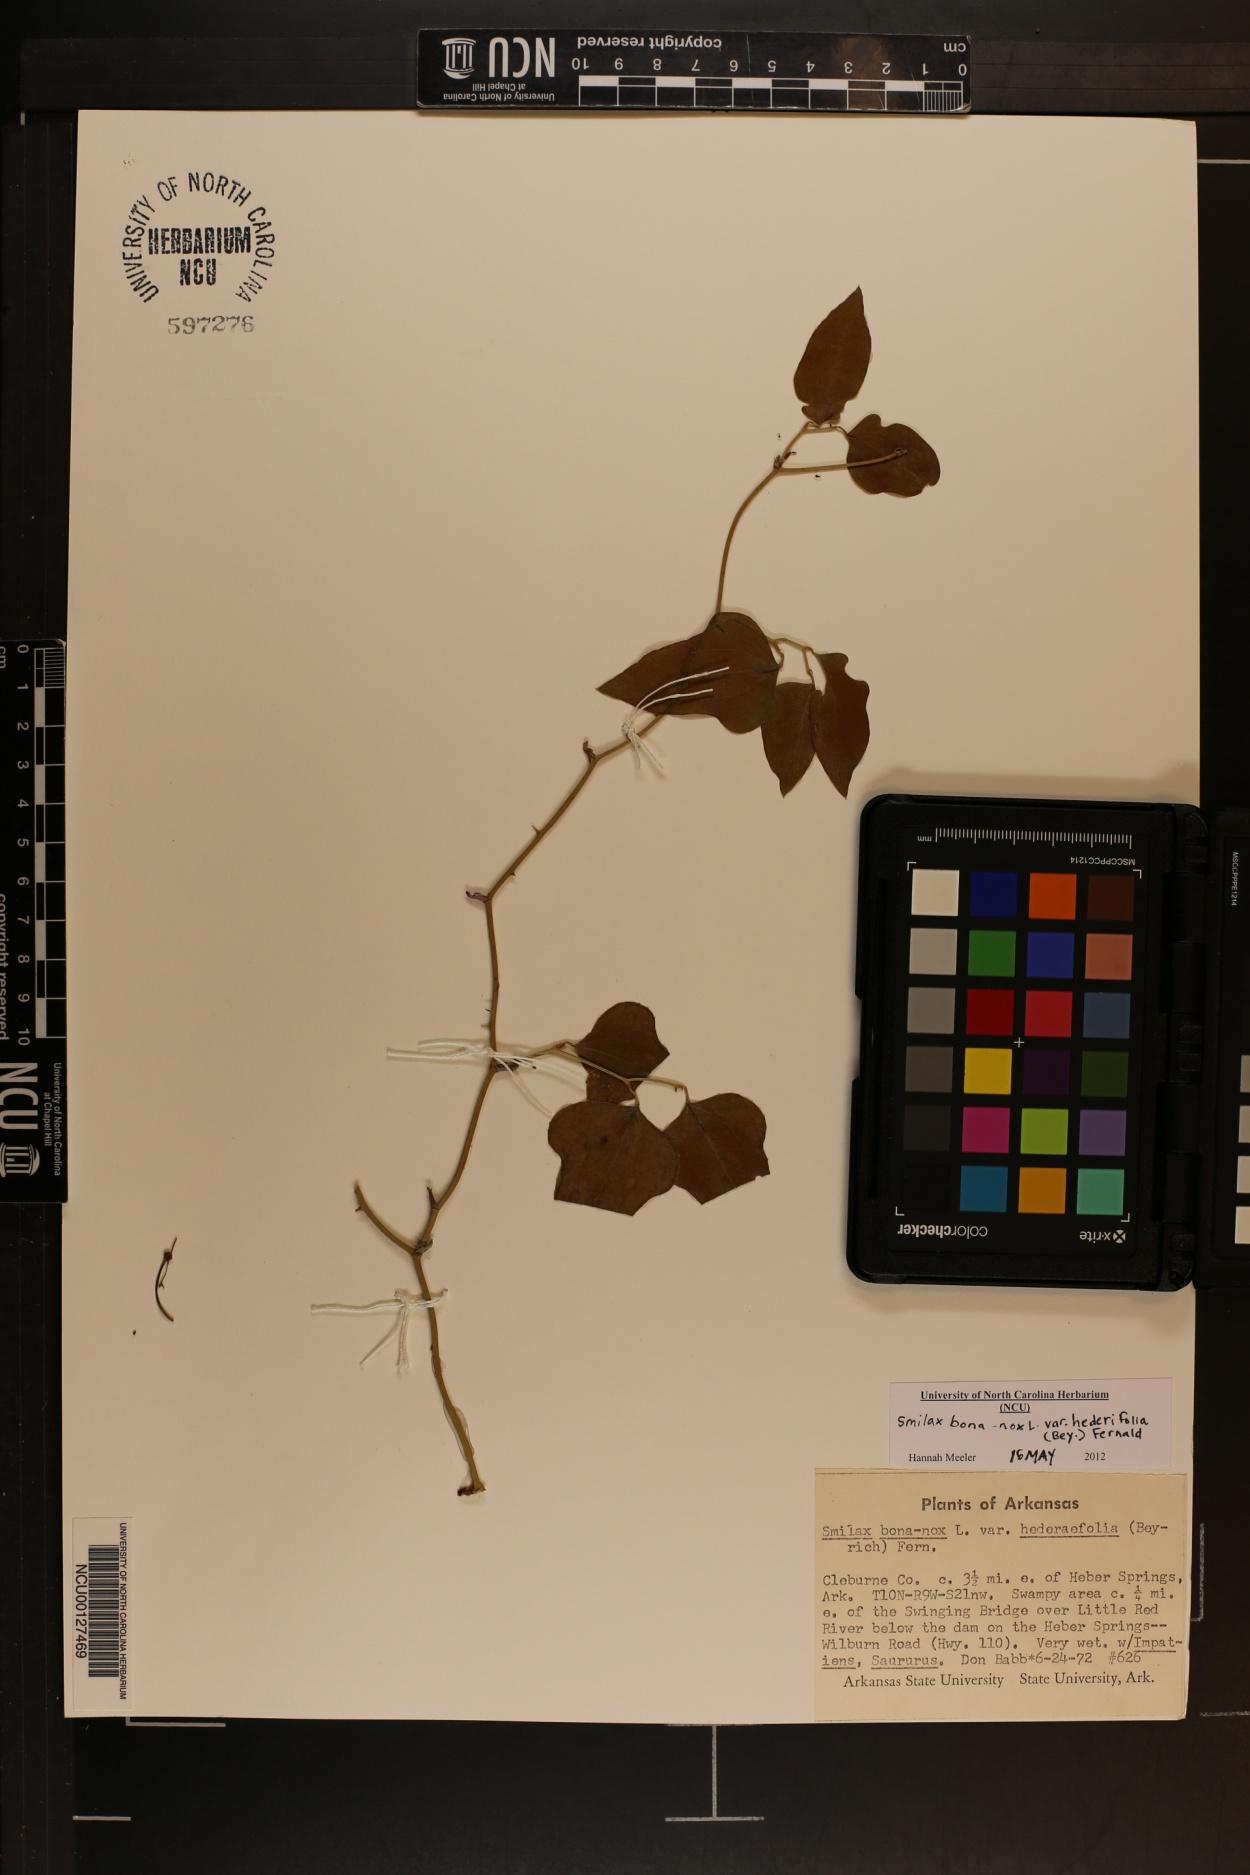 Smilax bona-nox var. hederifolia image